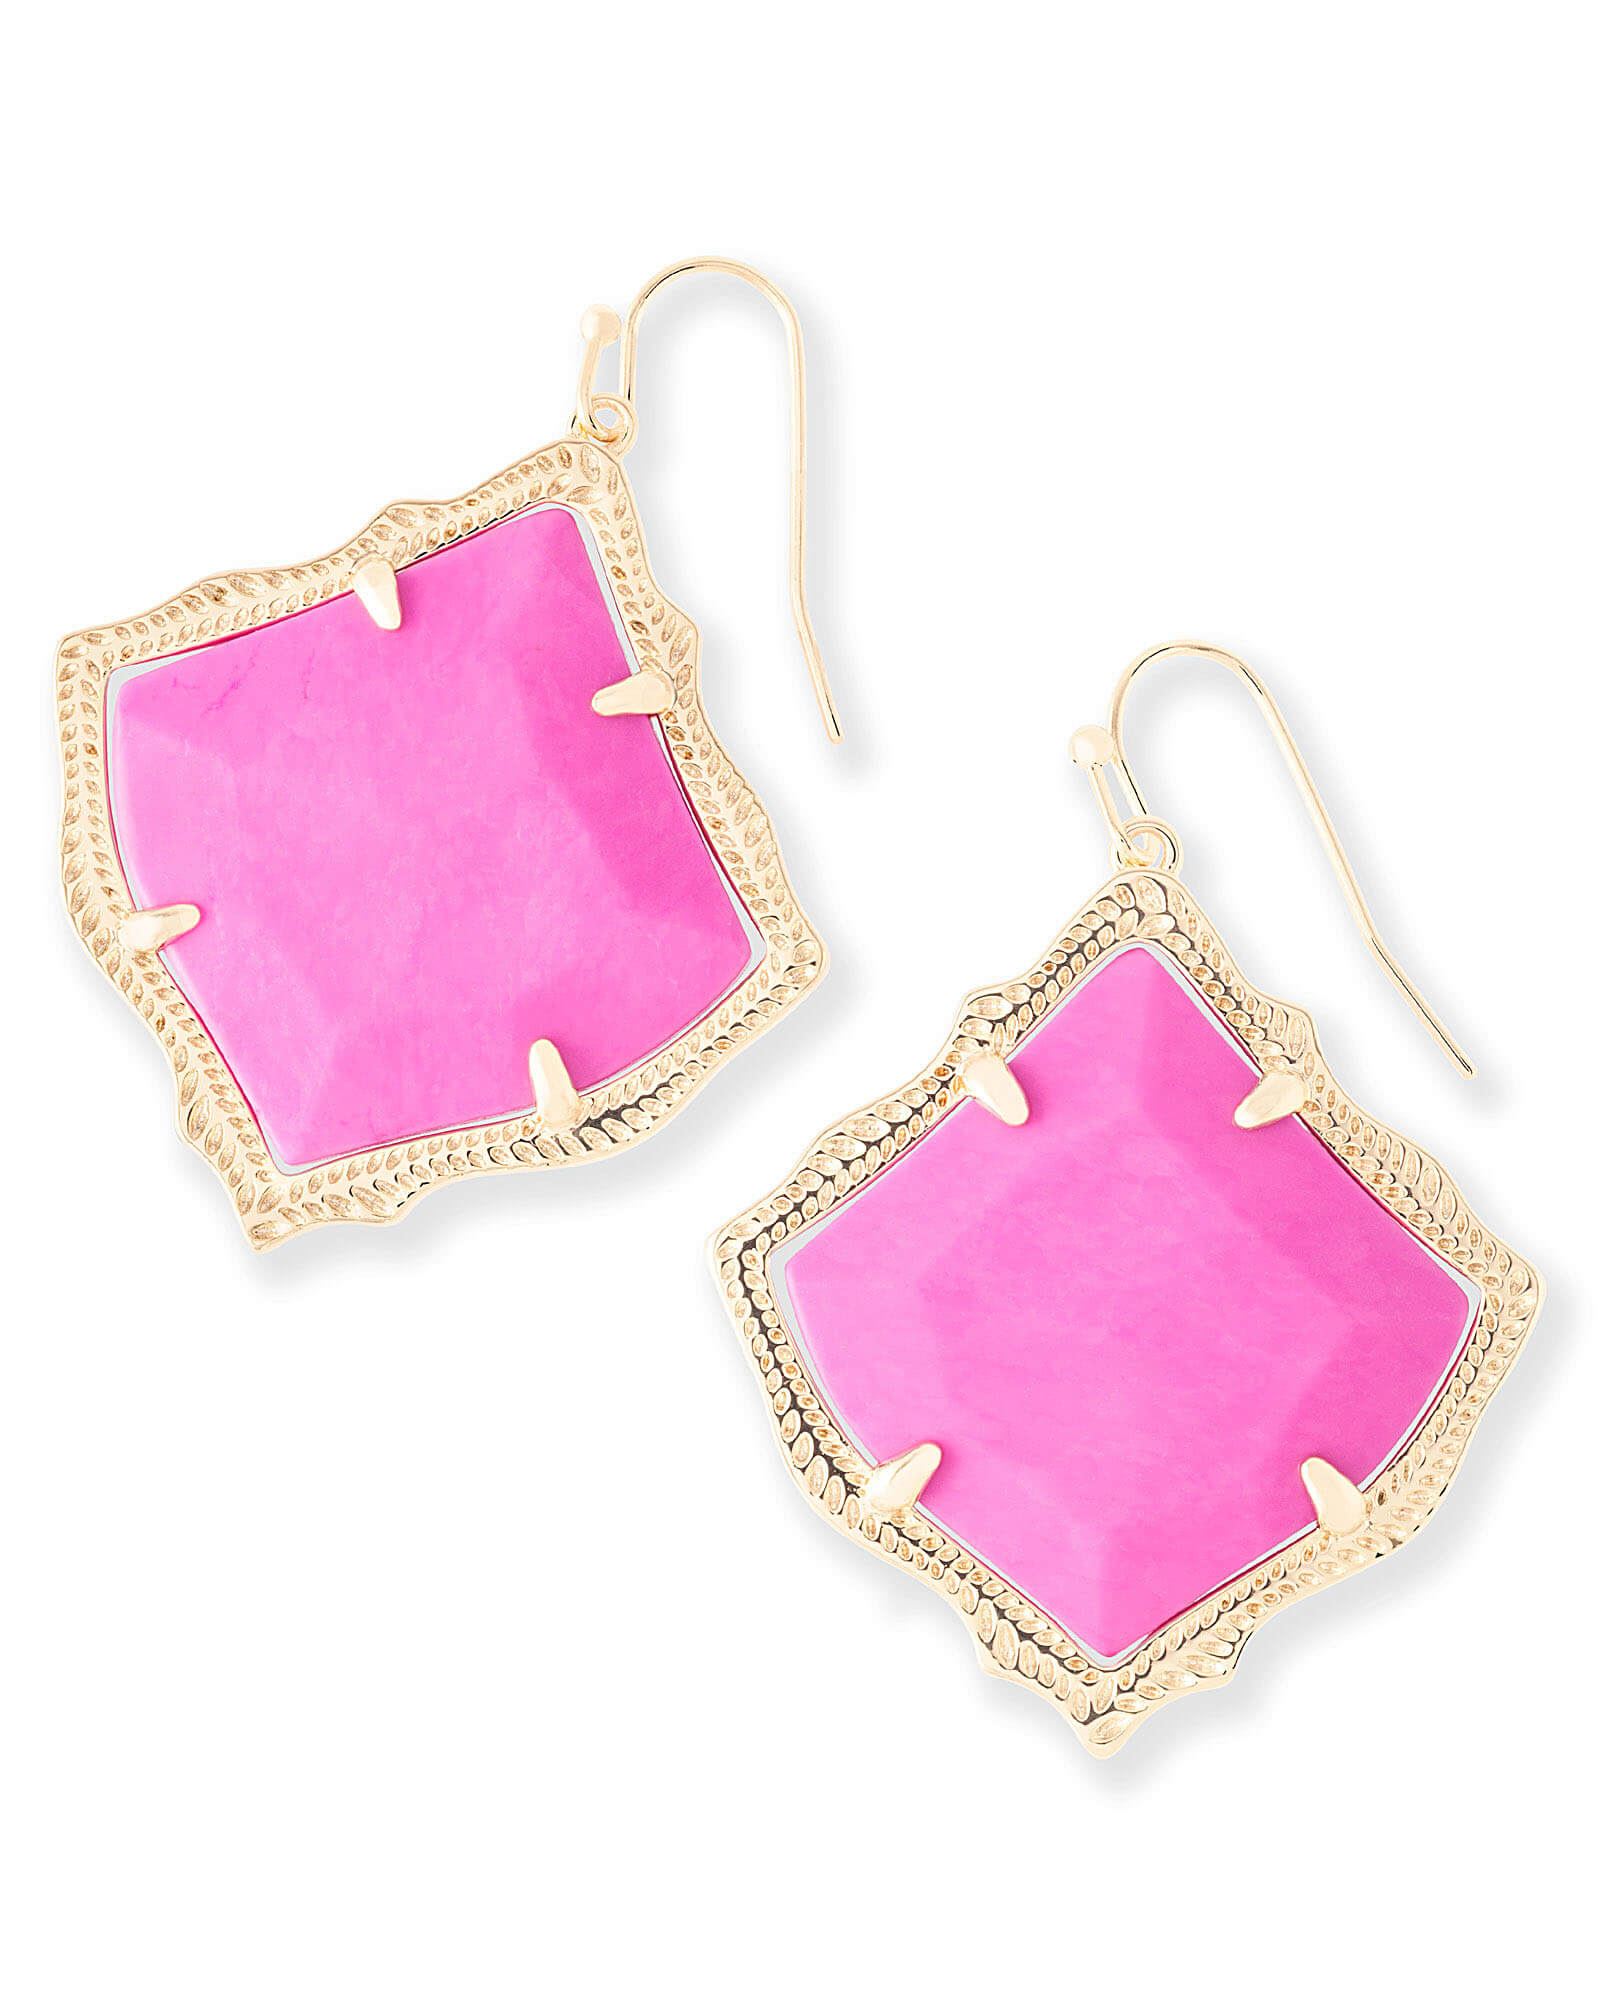 d44c20af457010 Kirsten Drop Earrings in Magenta | Kendra Scott Jewelry